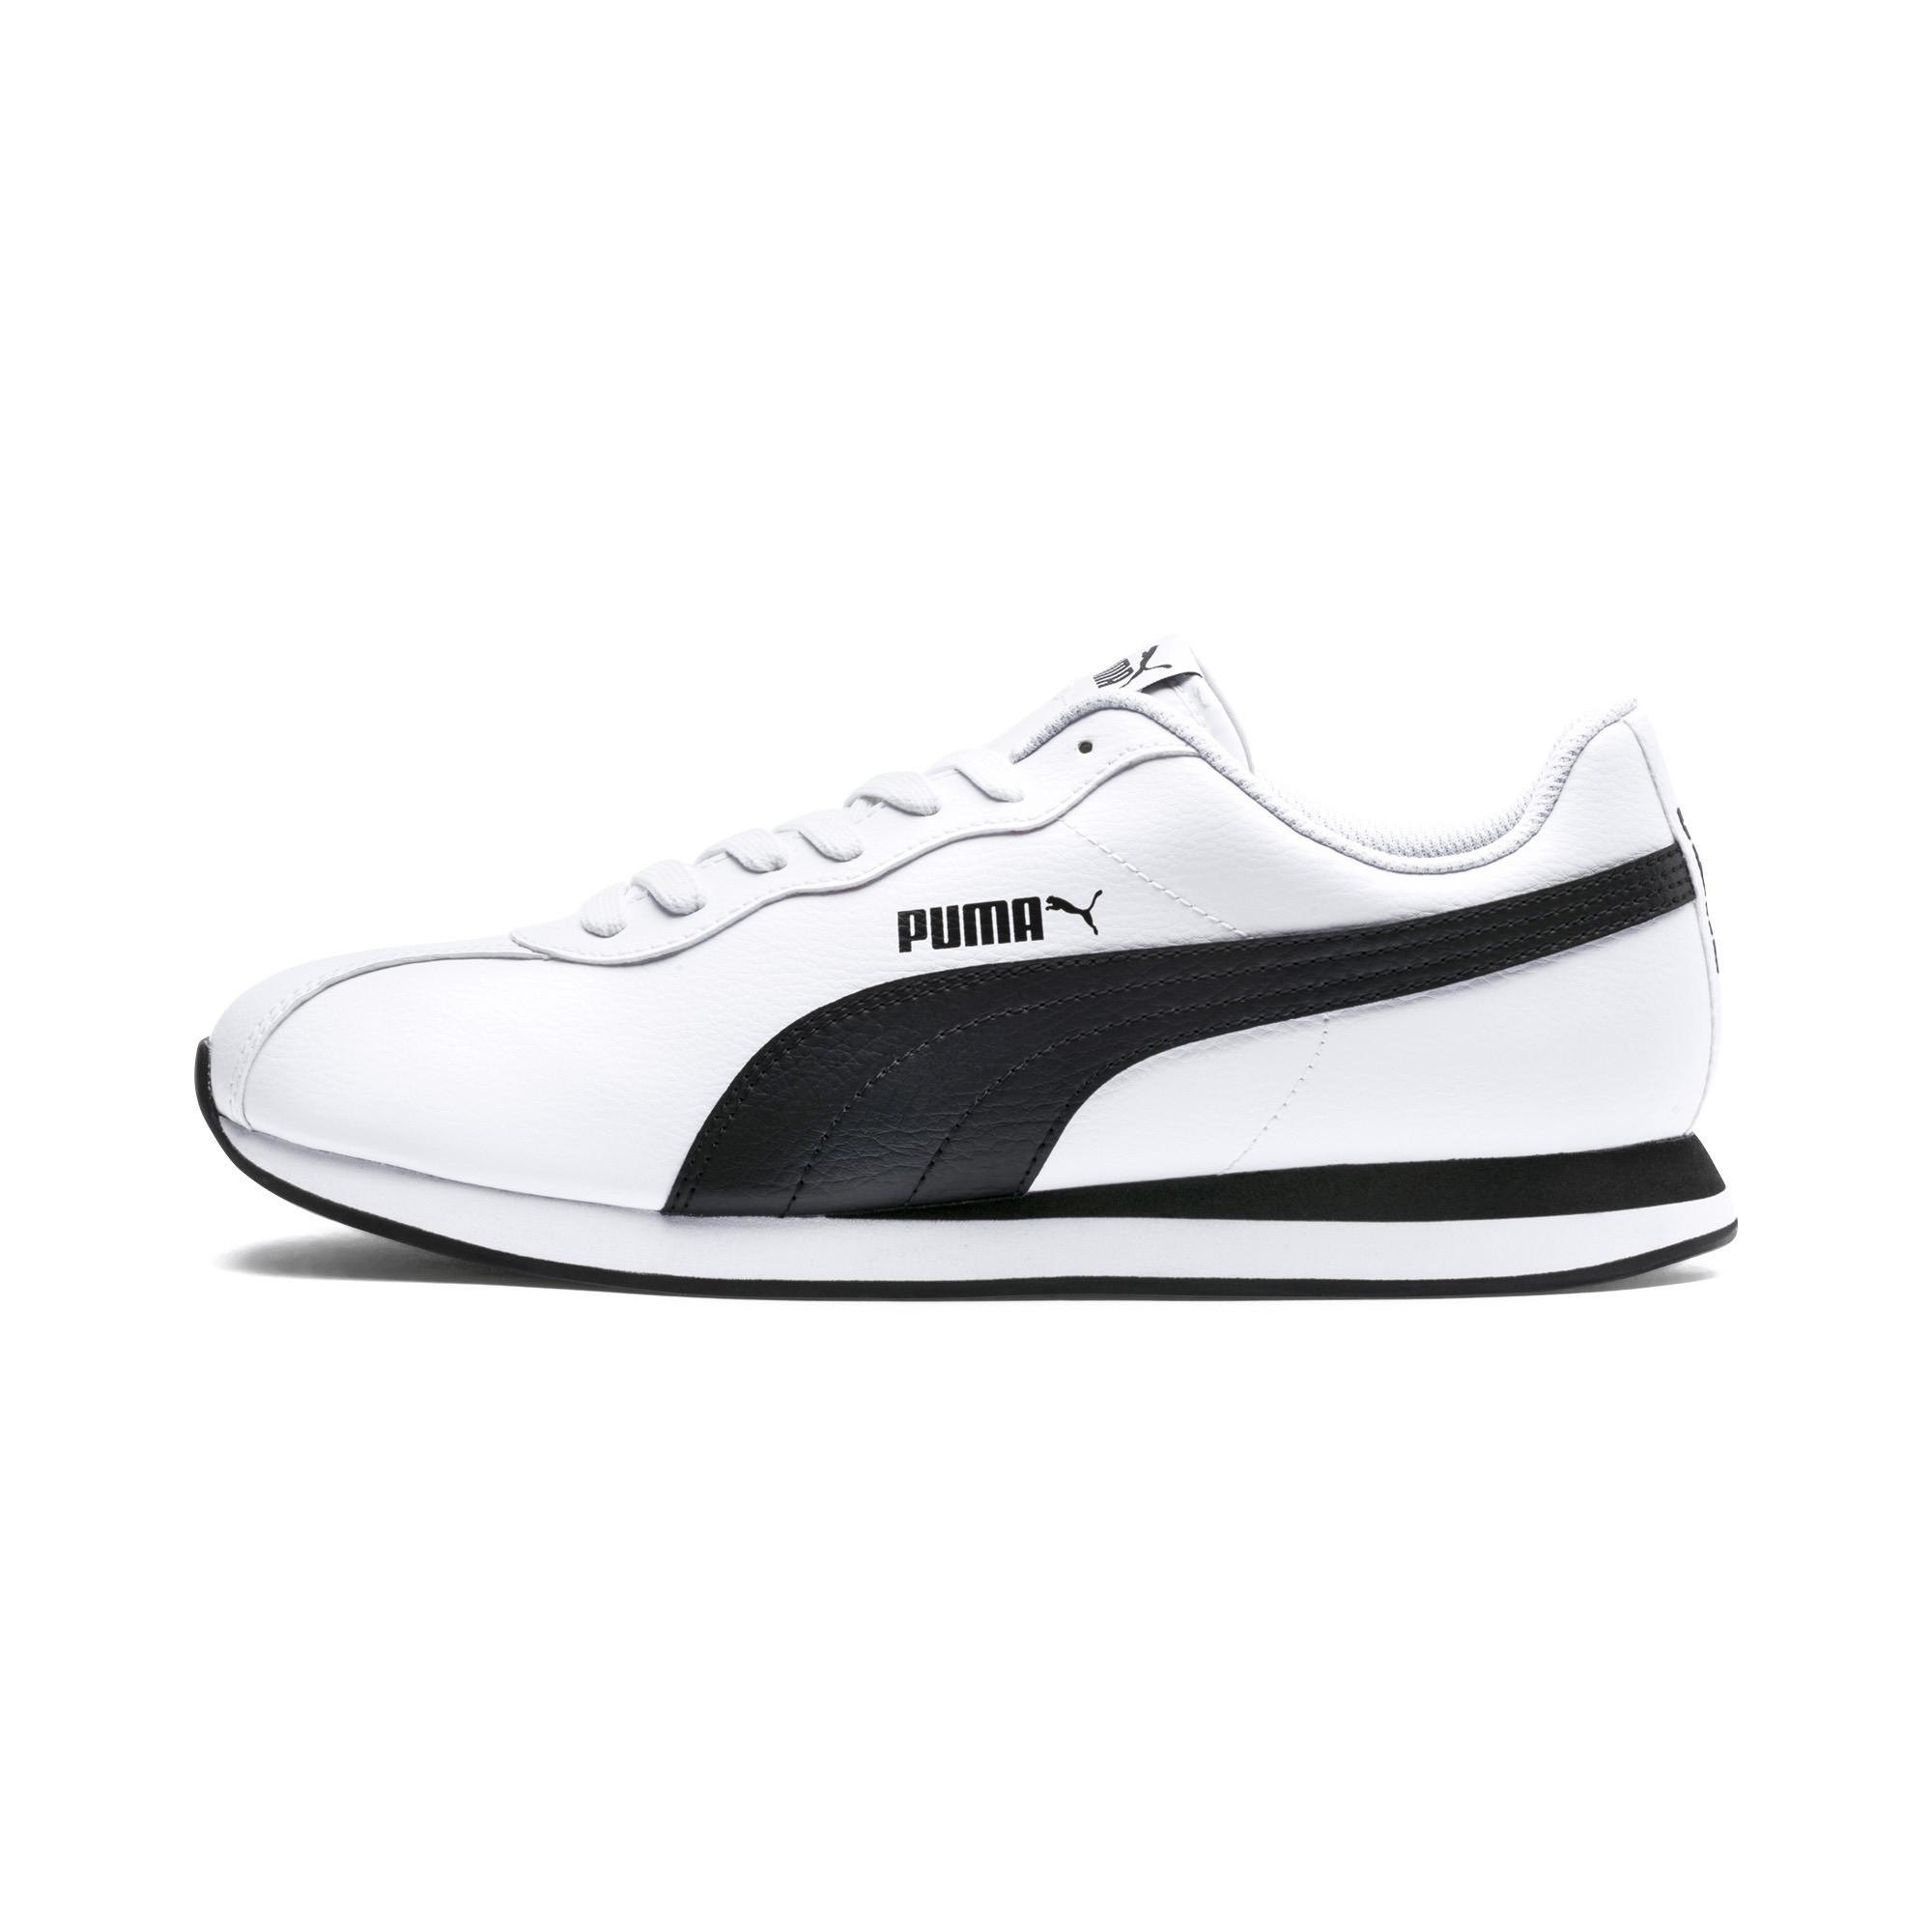 PUMA-Men-039-s-Turin-II-Sneakers thumbnail 16